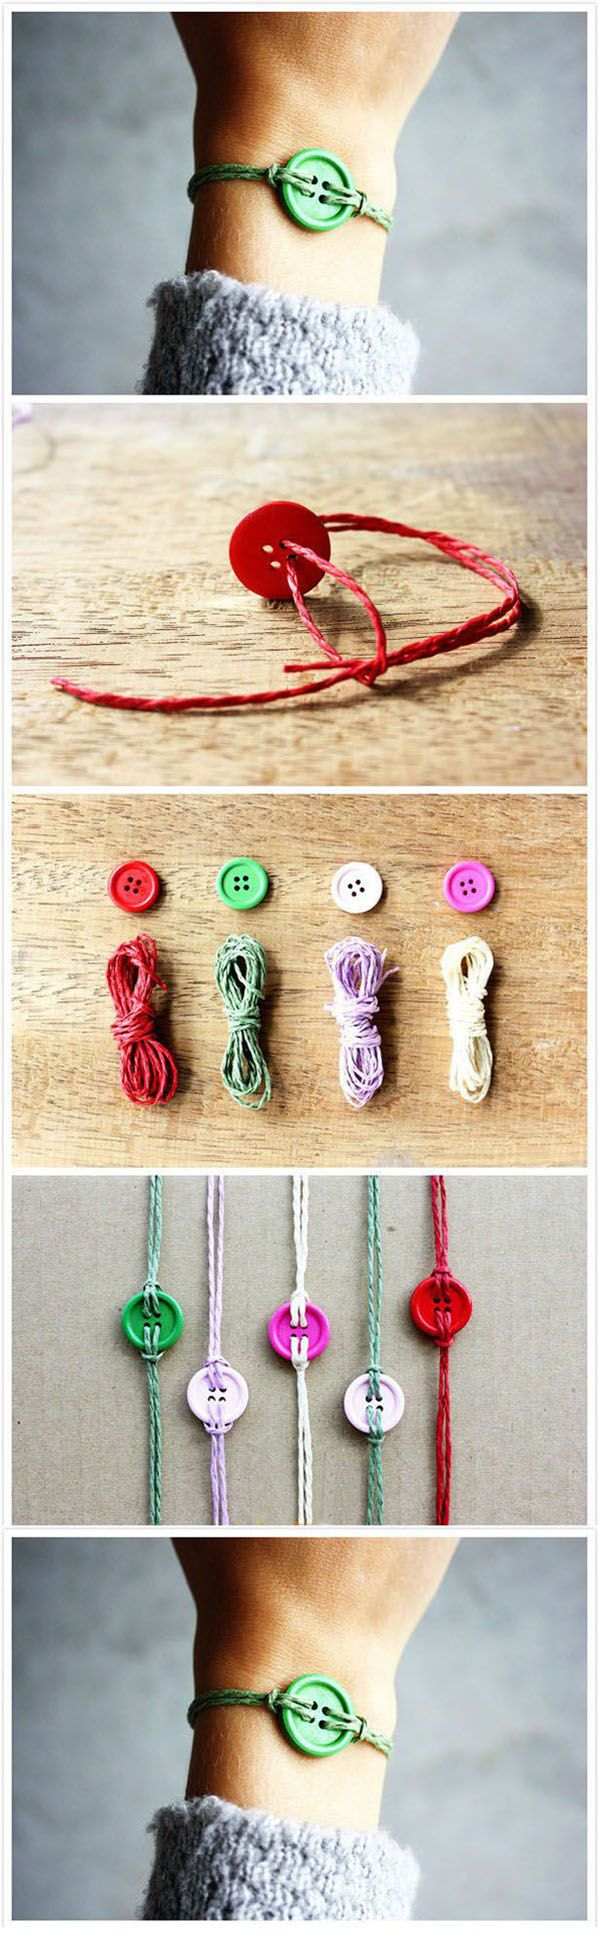 Diy Beautiful Button Bracelet | DIY  Crafts Tutorials